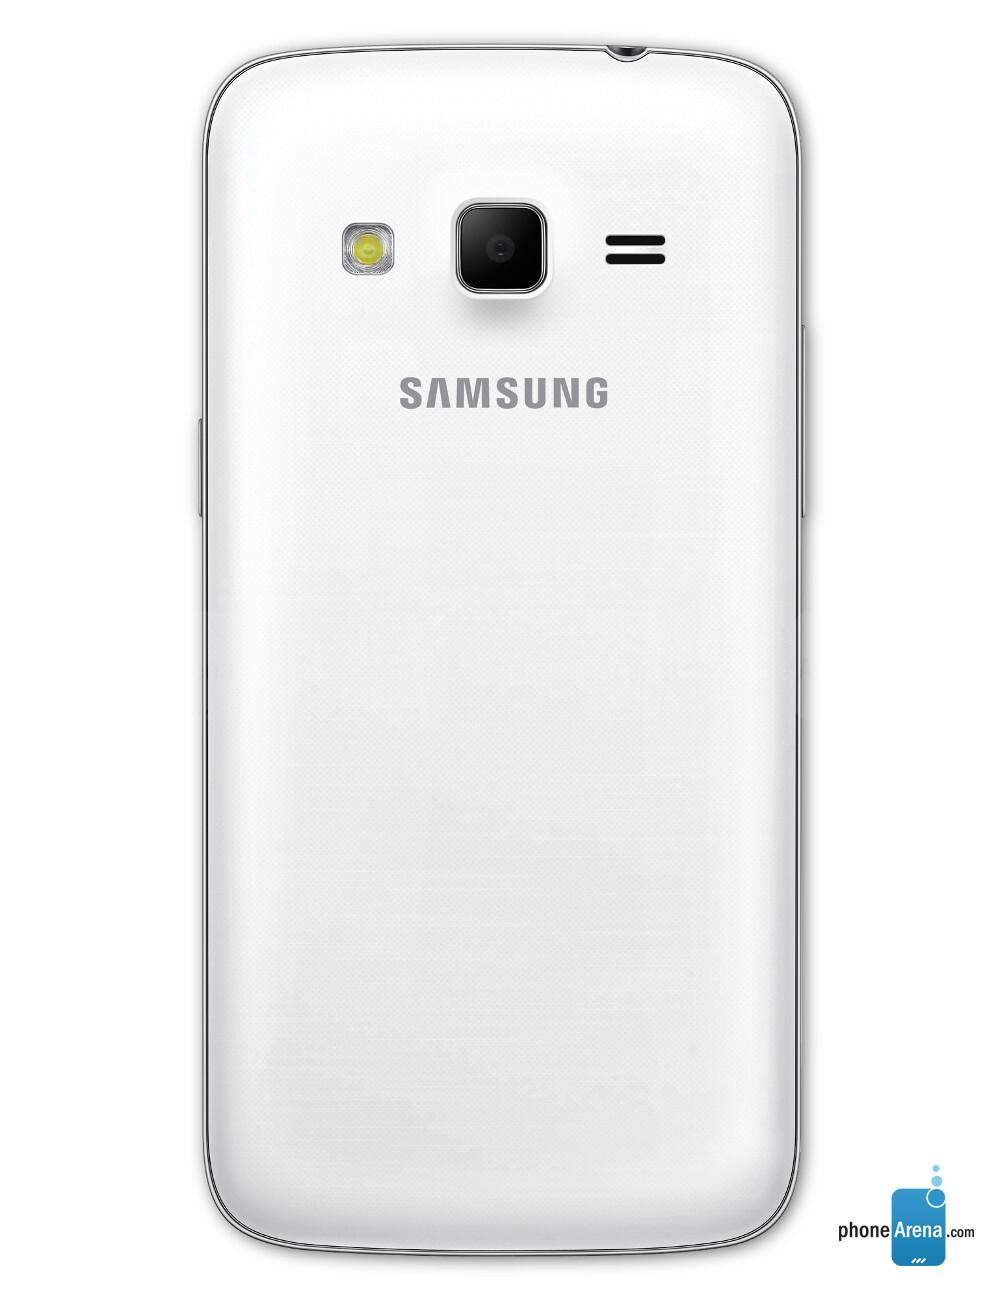 samsung galaxy express 3 user manual